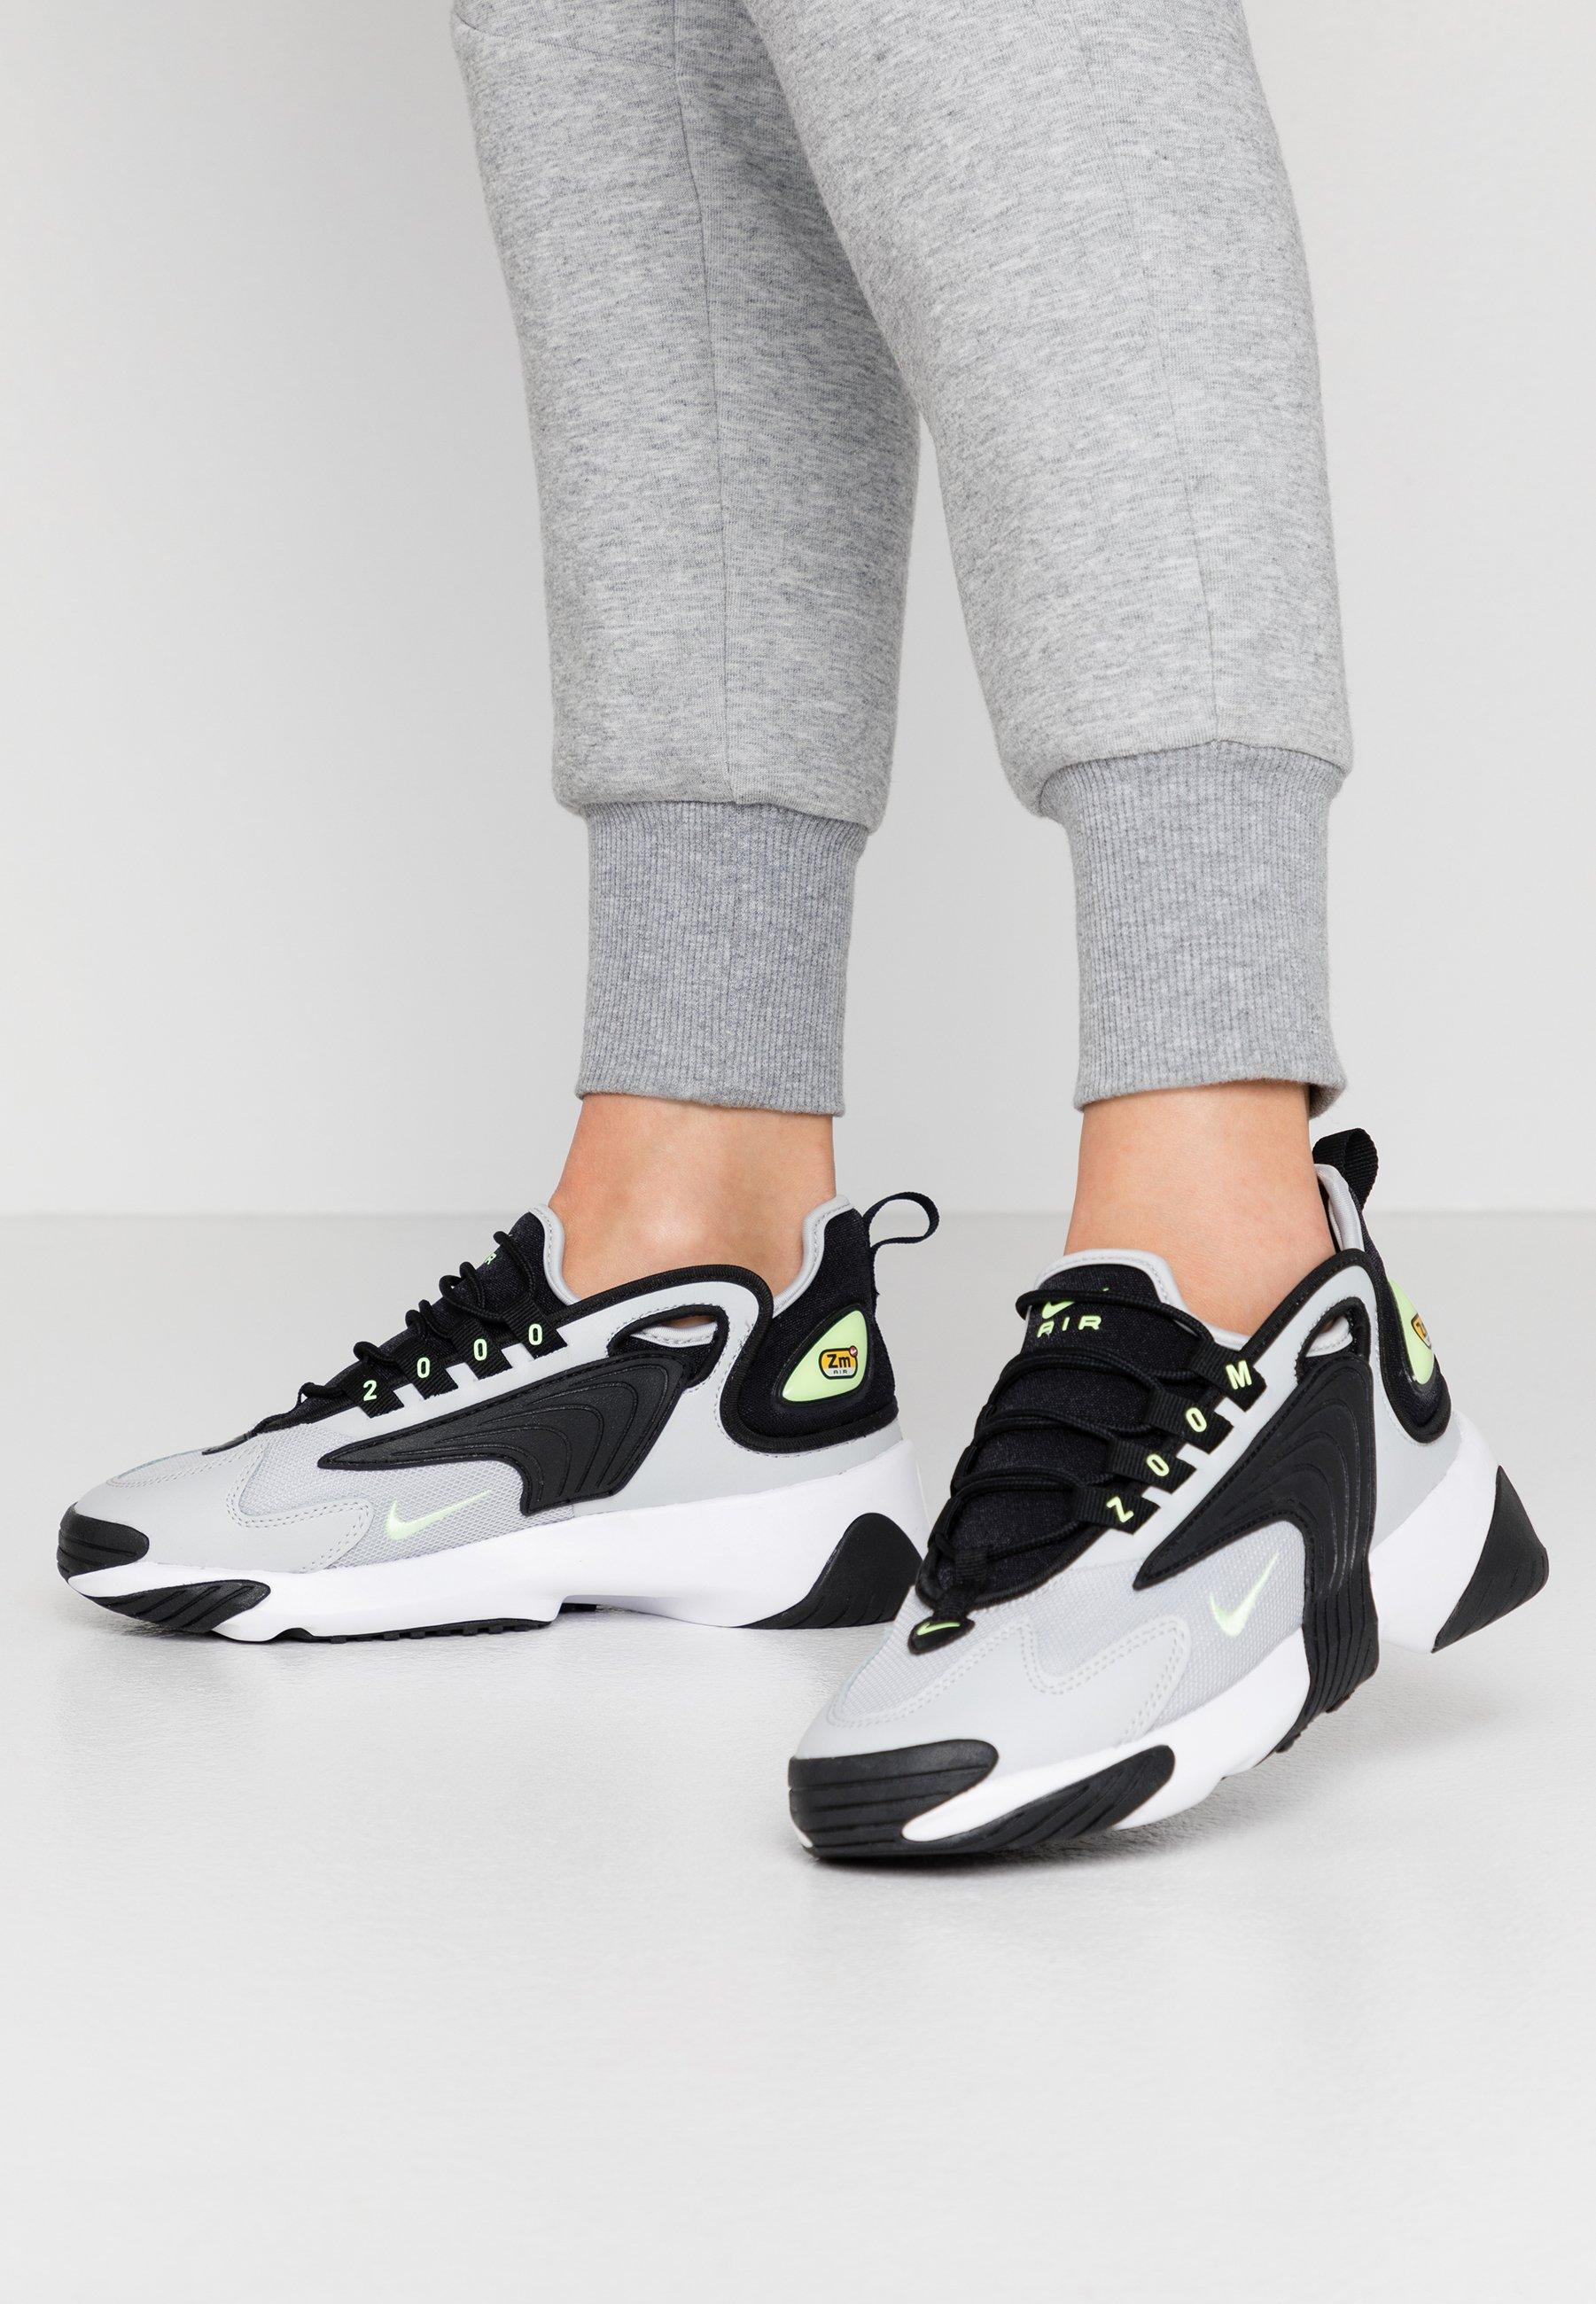 Nike Sportswear ZOOM 2K Joggesko blue furyblackwhite